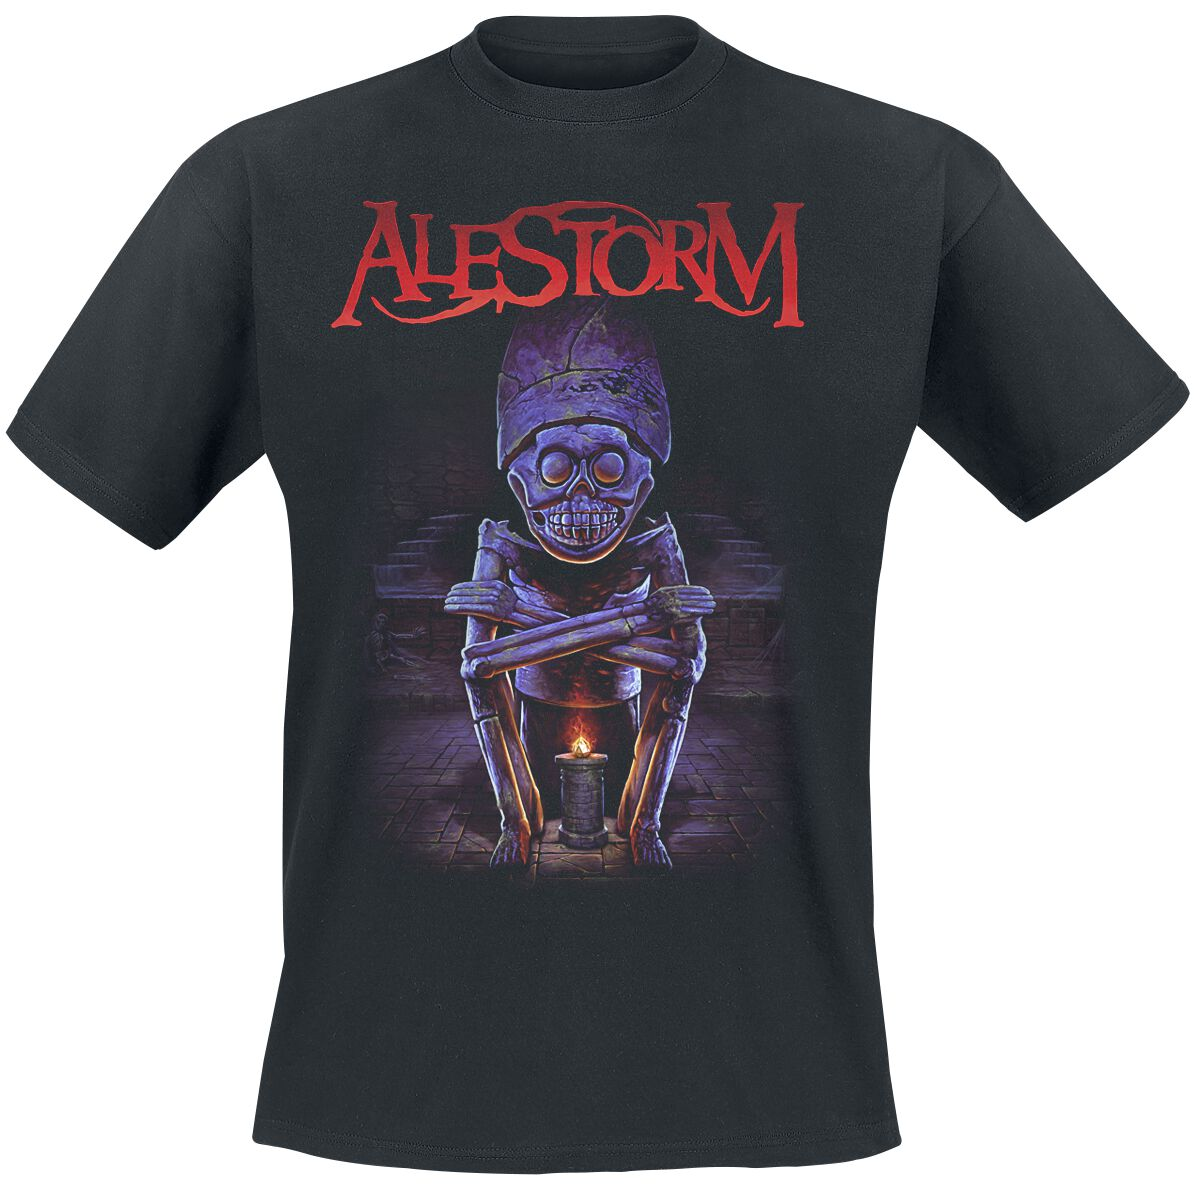 Image of Alestorm Big Ship, Little Ship T-Shirt schwarz